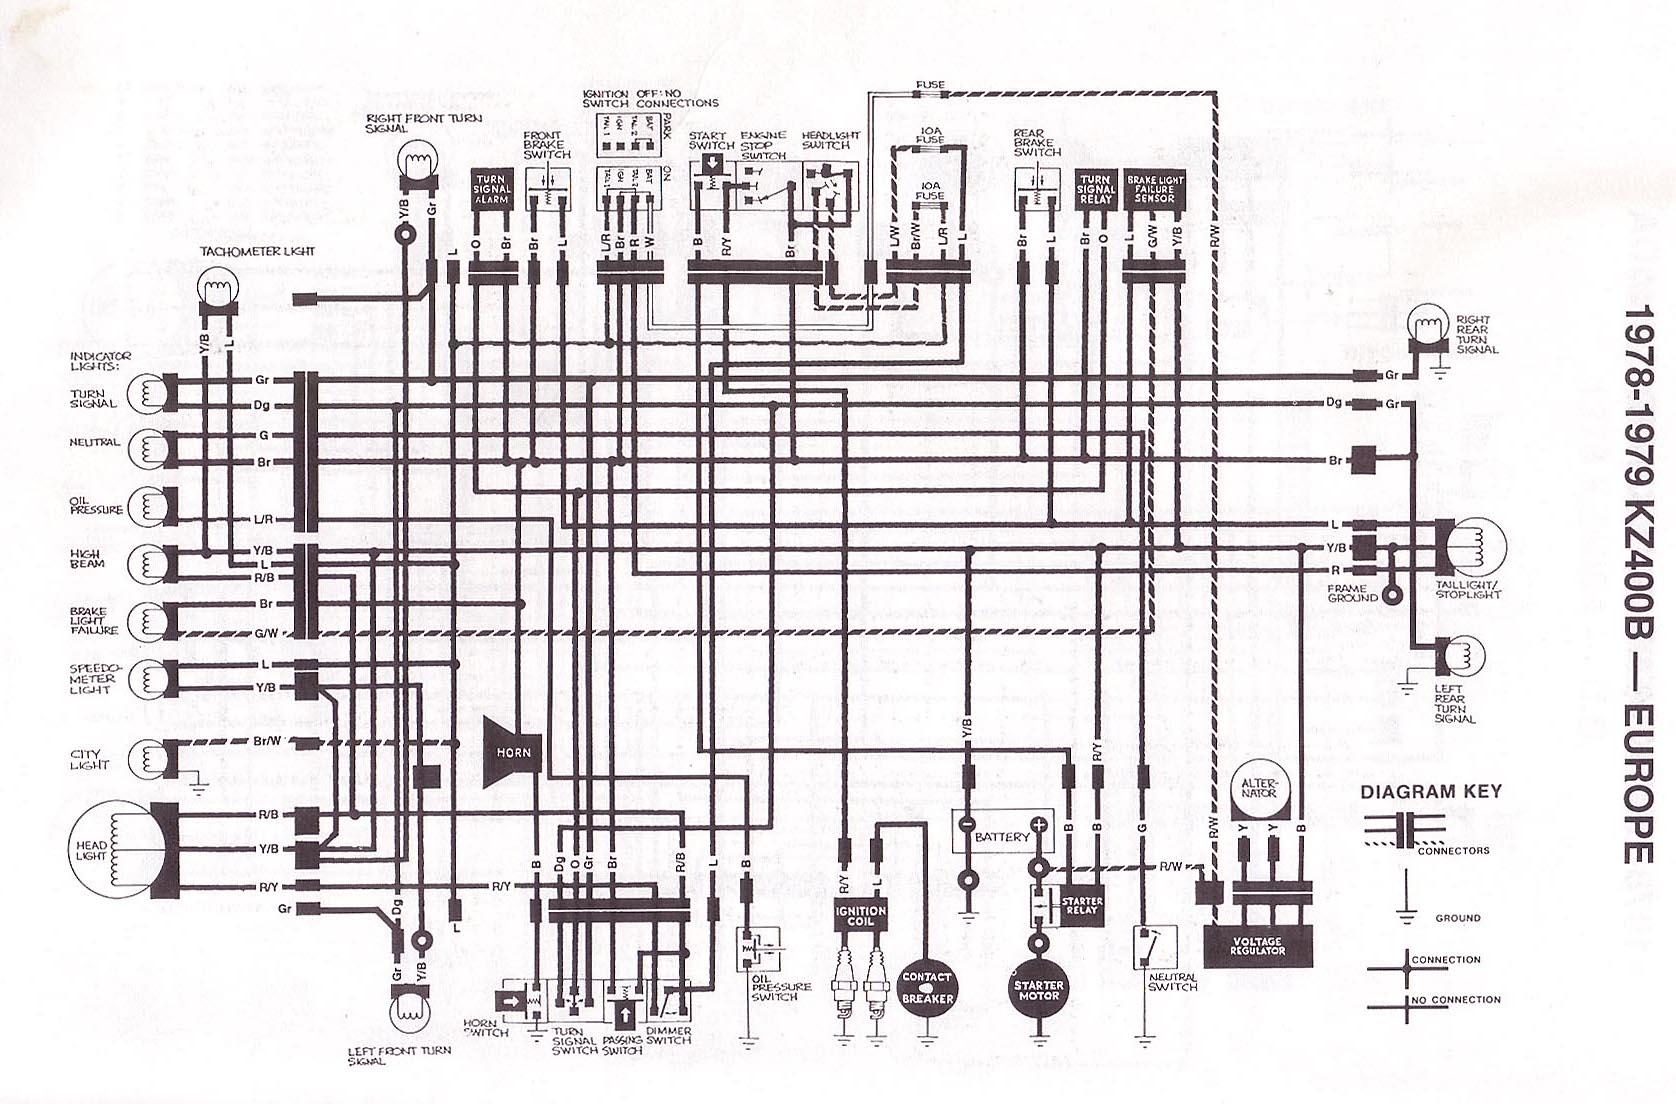 1976 Kz400 Wiring Diagram Schematic Circuit 2002 Kawasaki Prairie 400 Index Of Techh Tips Bilder Diagrams Brute Force 750